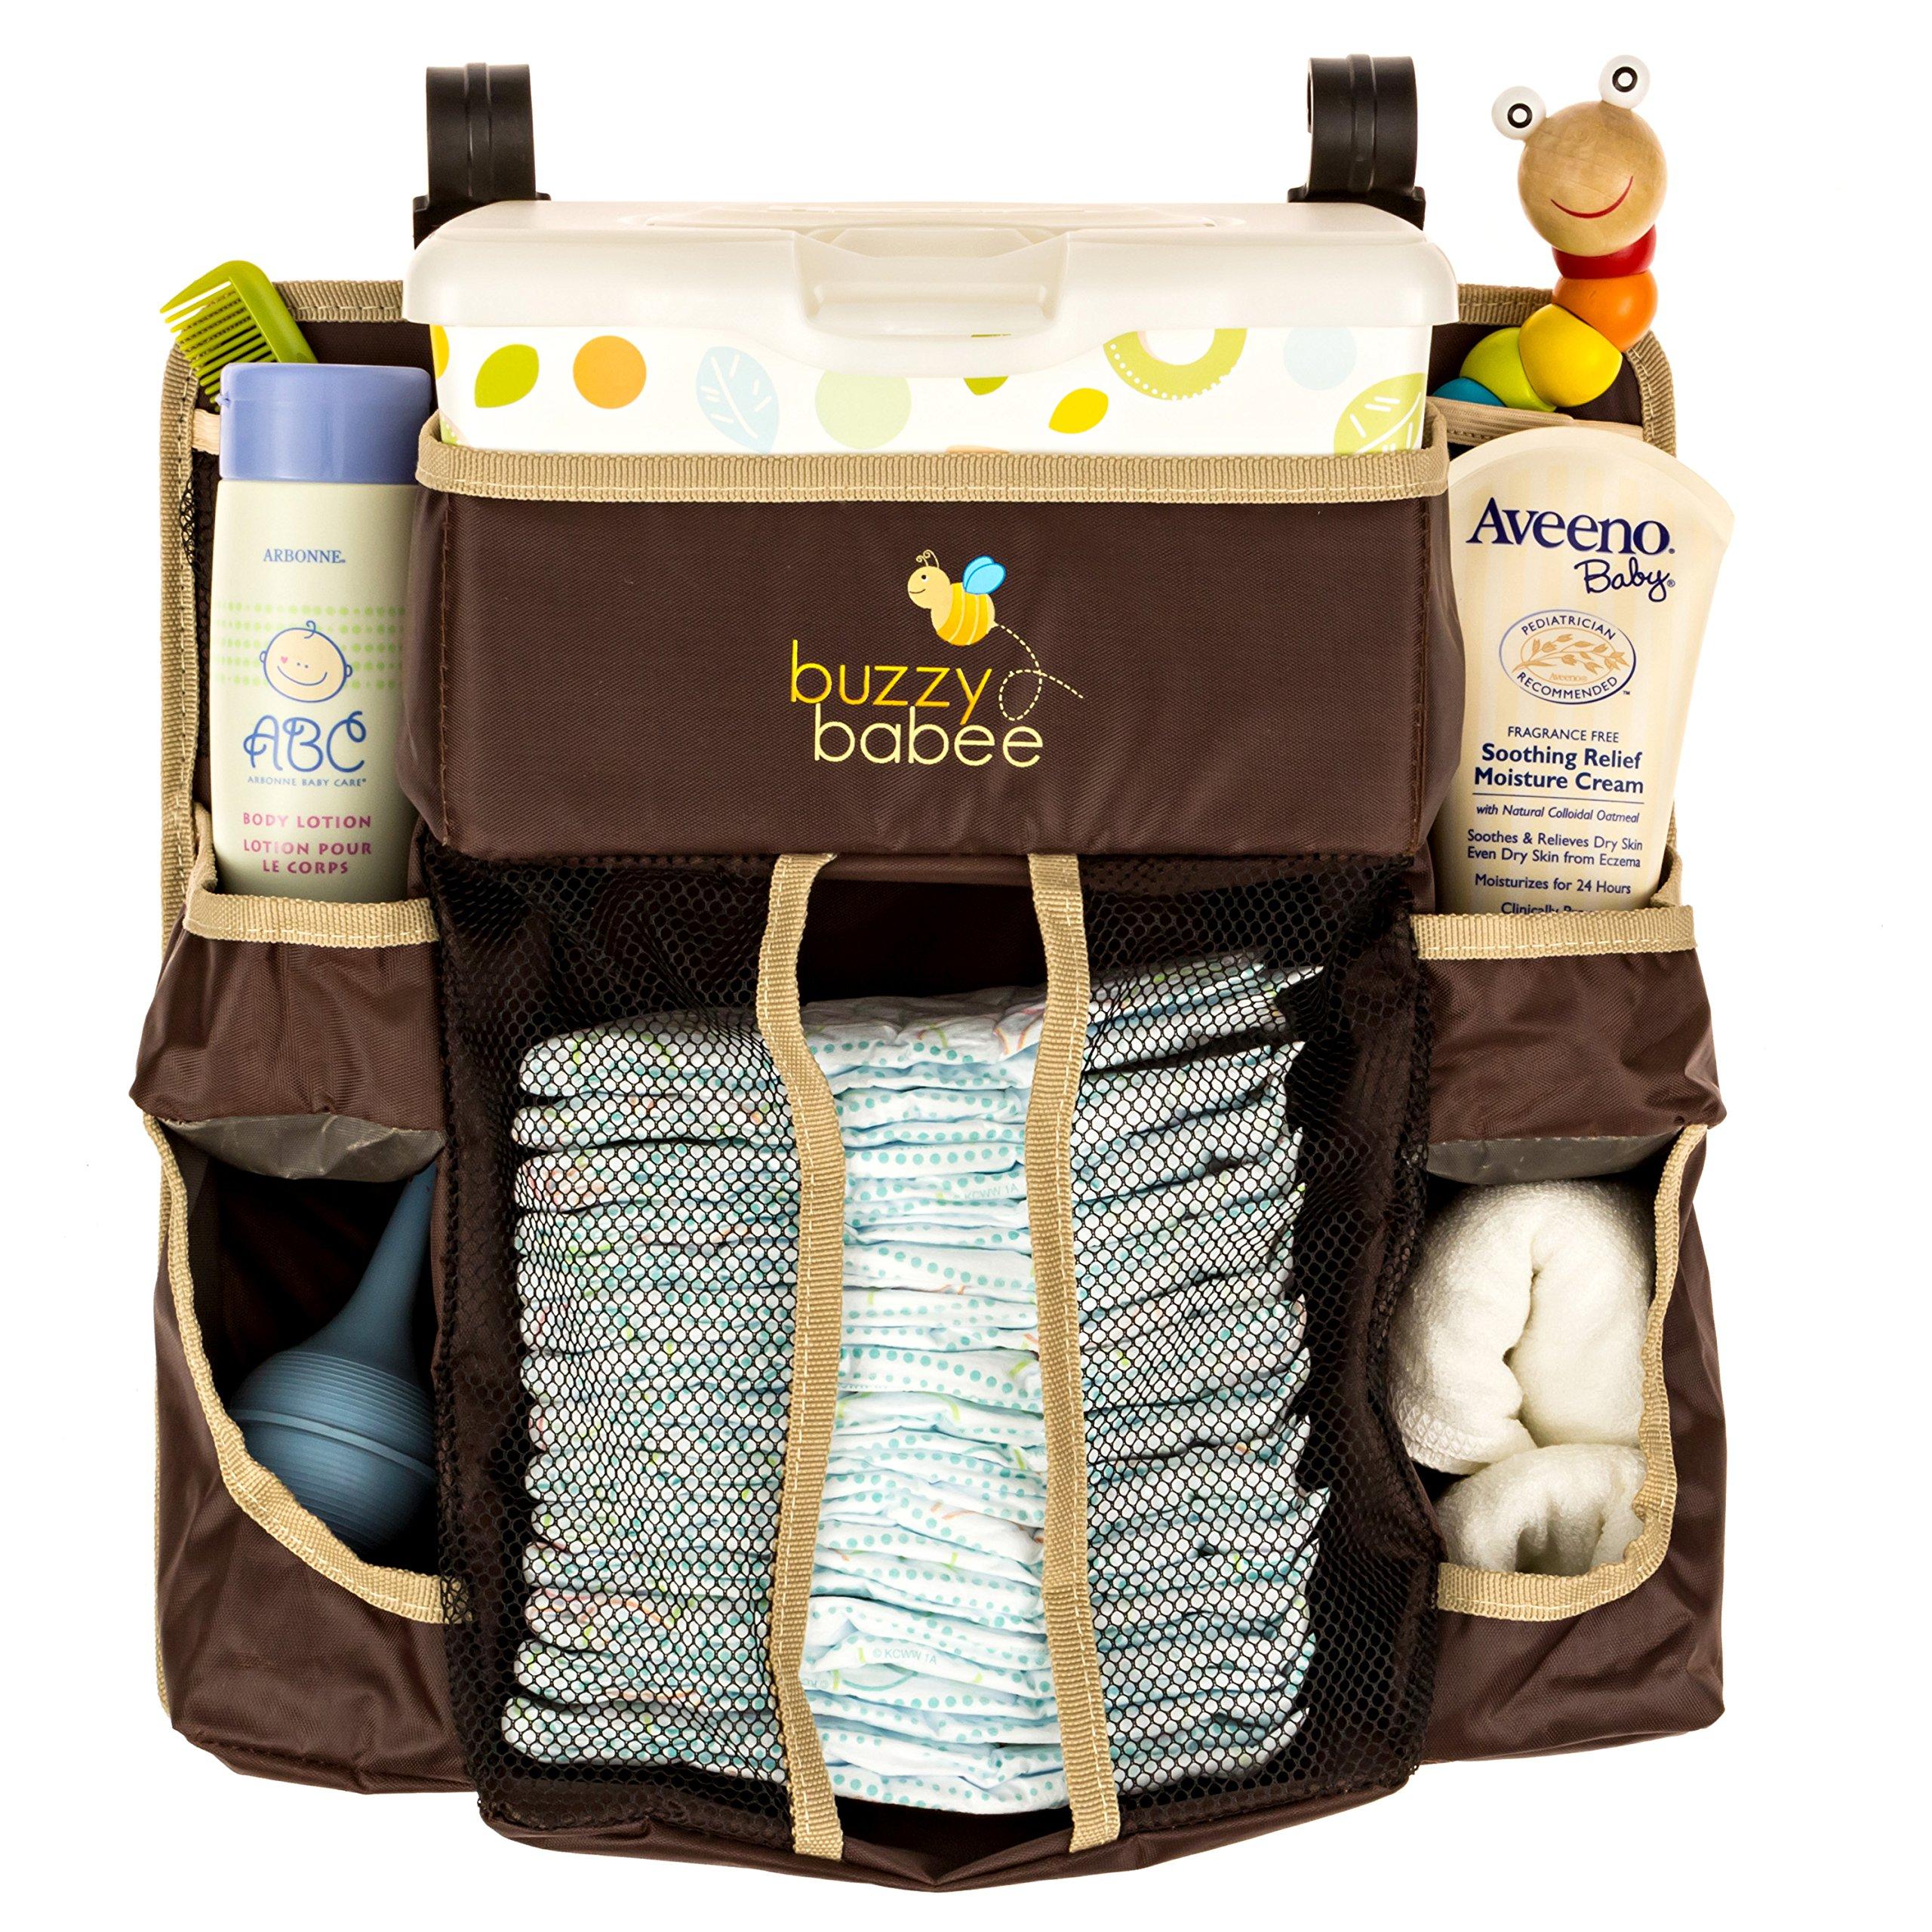 Buzzy Babee Diaper Change Organizer, Brown/Coffee Perfect Diaper Caddy & Playard Organizer